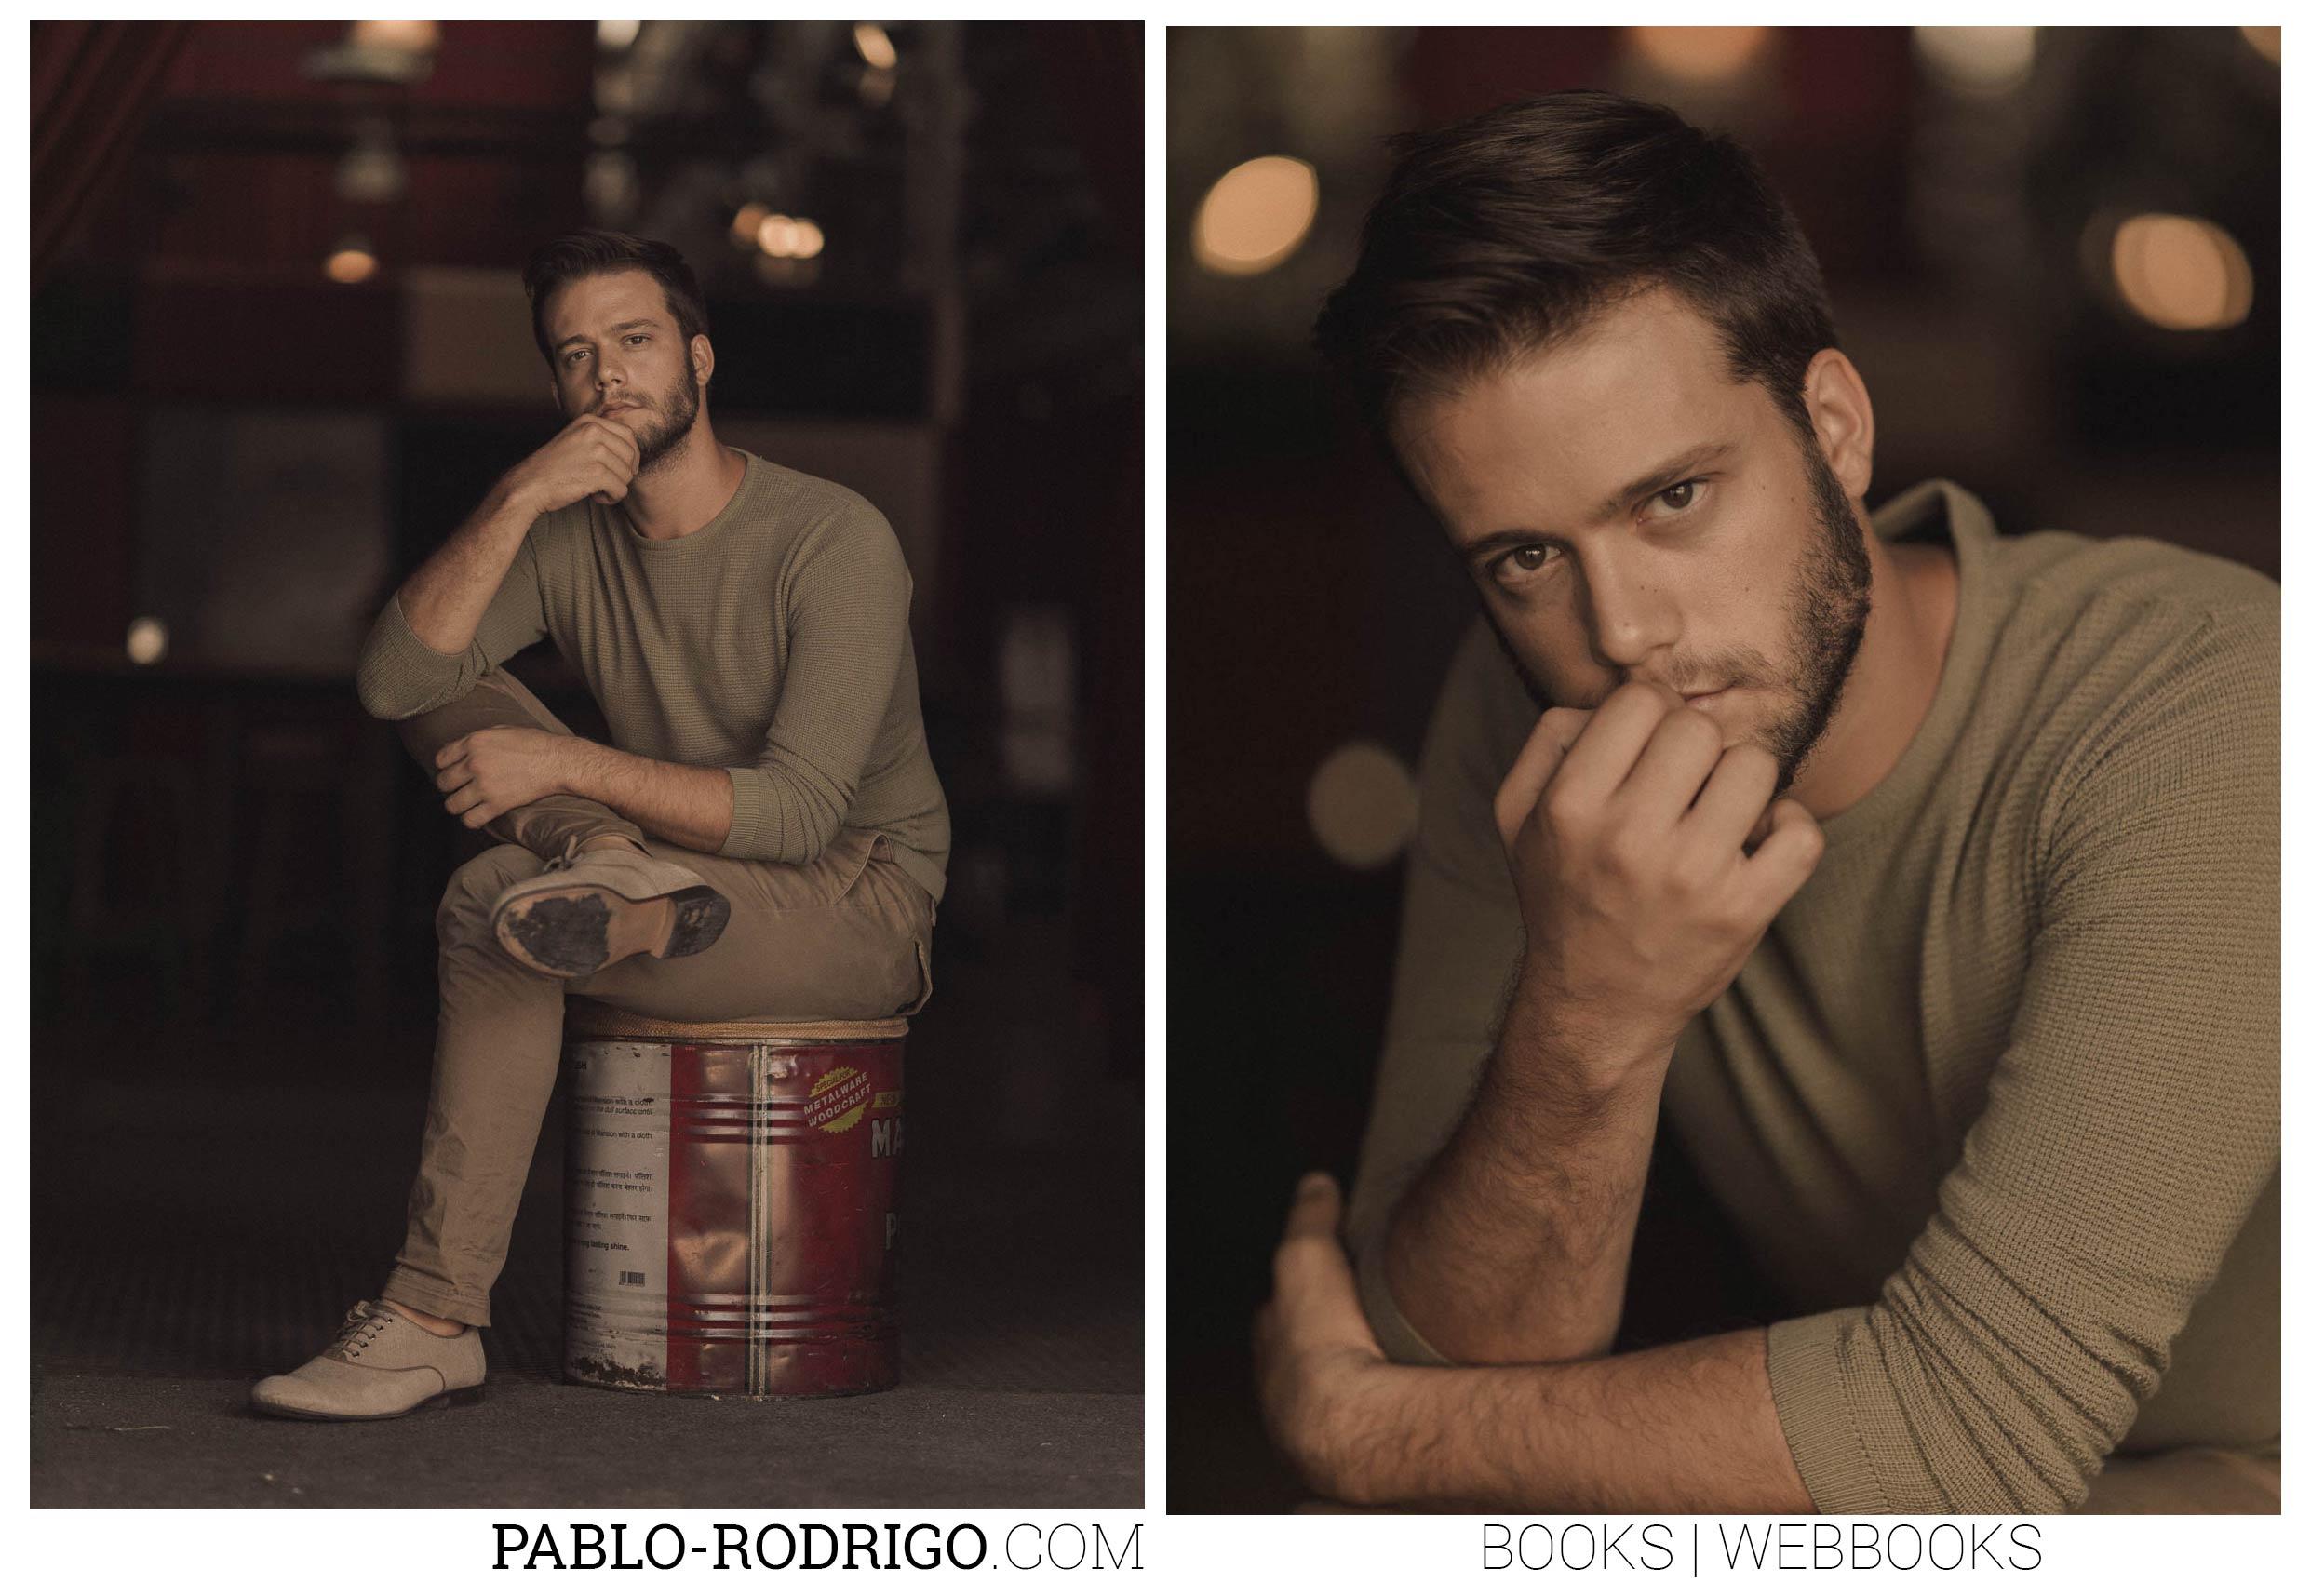 Pablo-Rodrigo-Books-fotografo-madrid-jaime-riba-002.jpg